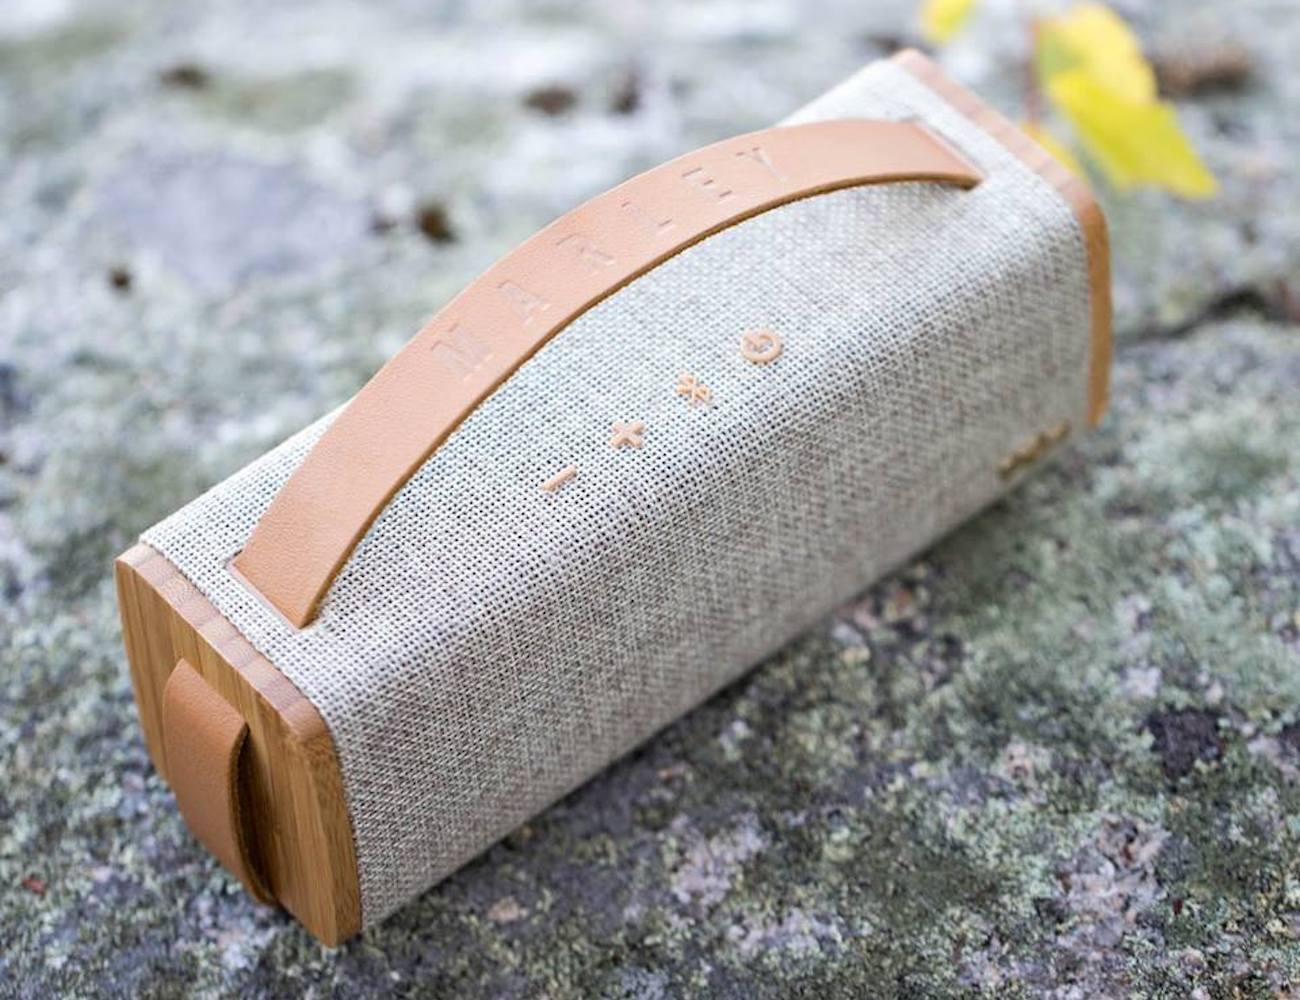 House of Marley Riddim Portable Bluetooth Speaker